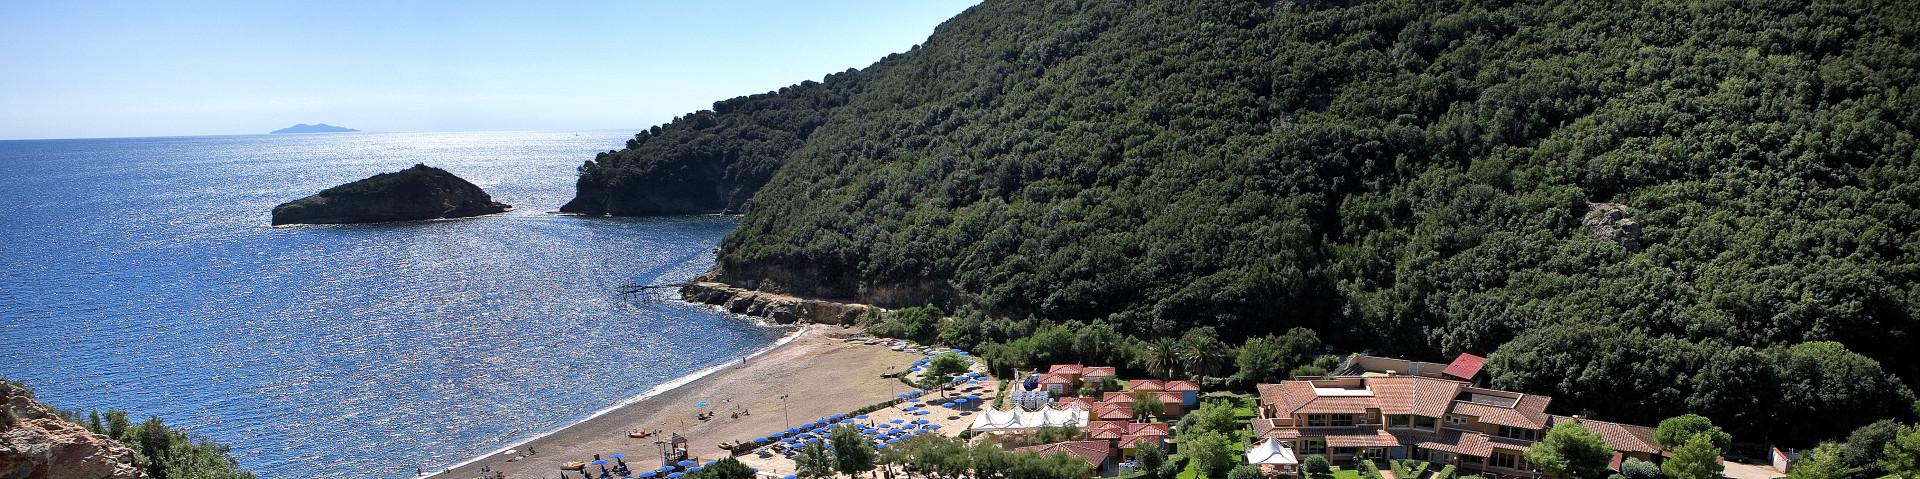 Rio Marina, v údolí Ortano Mare